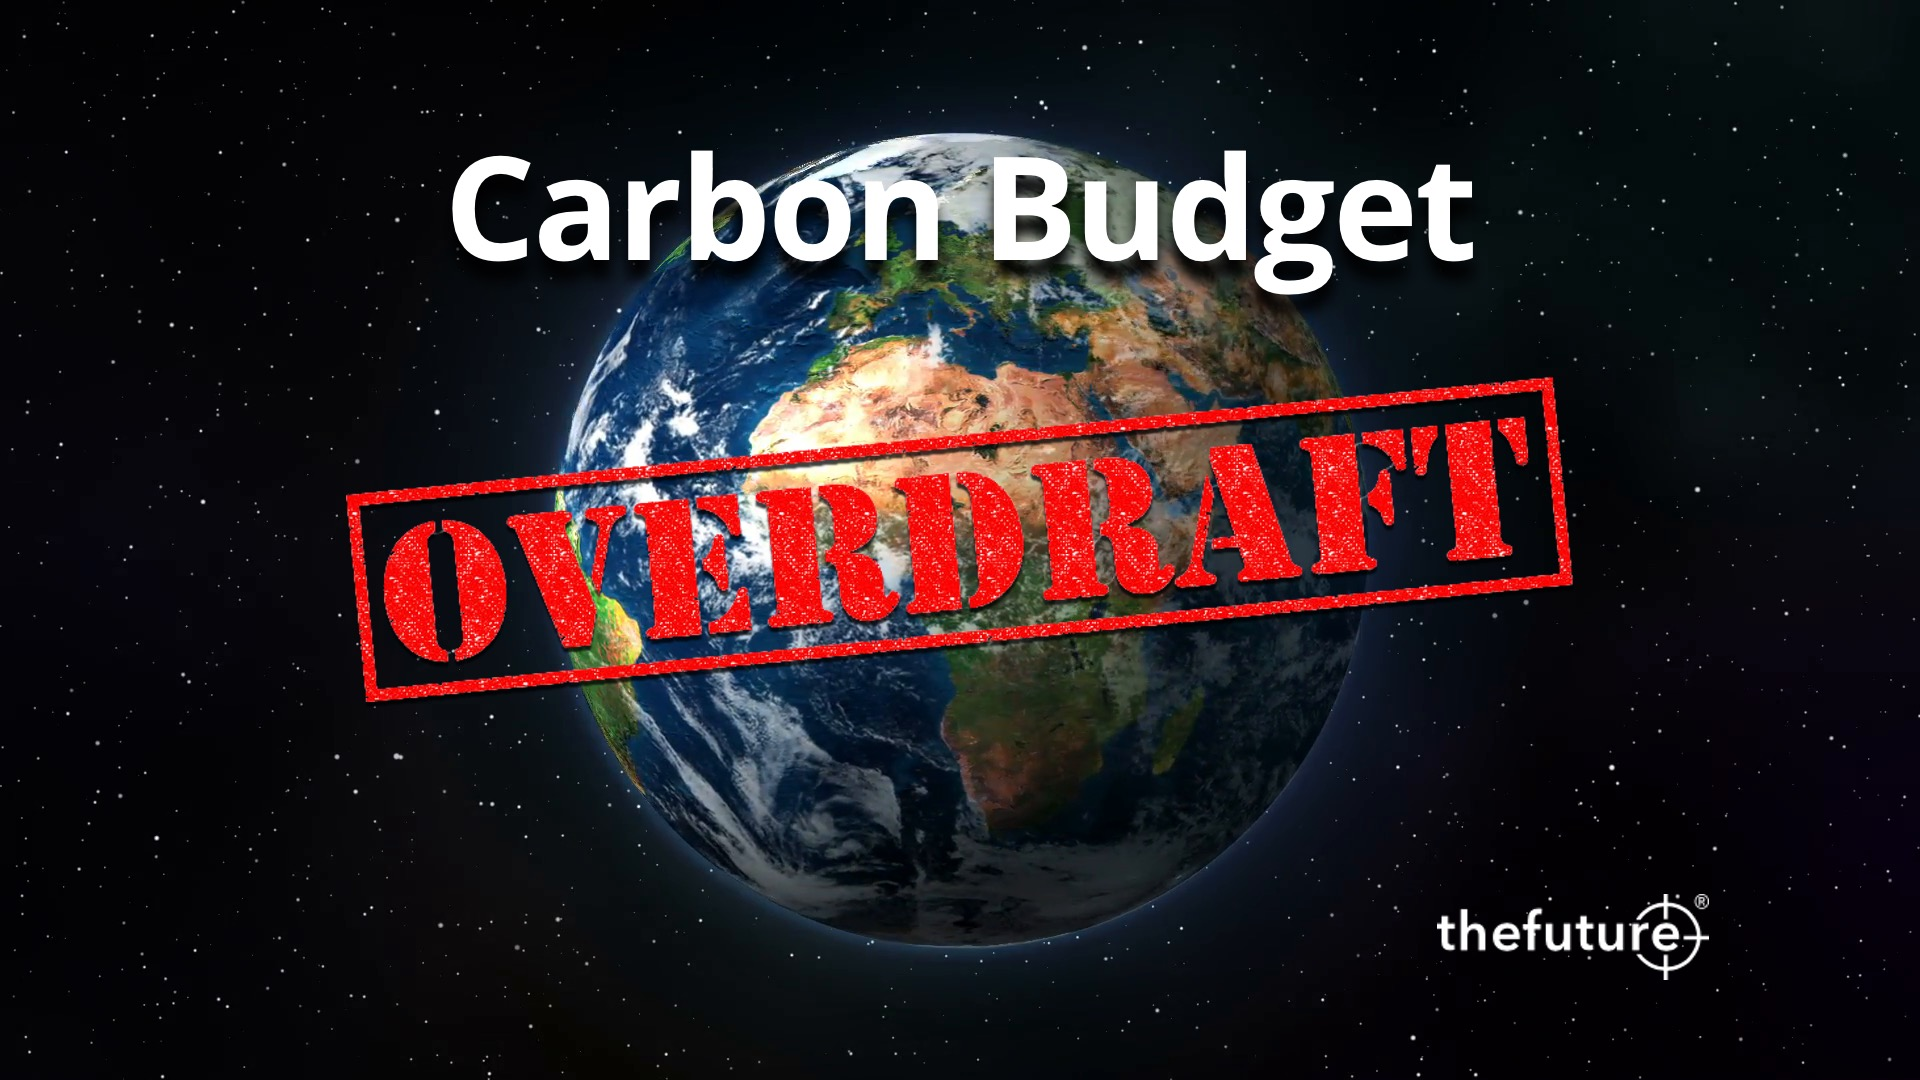 thefuture, Blogg, Carbon Budget, Overdraft